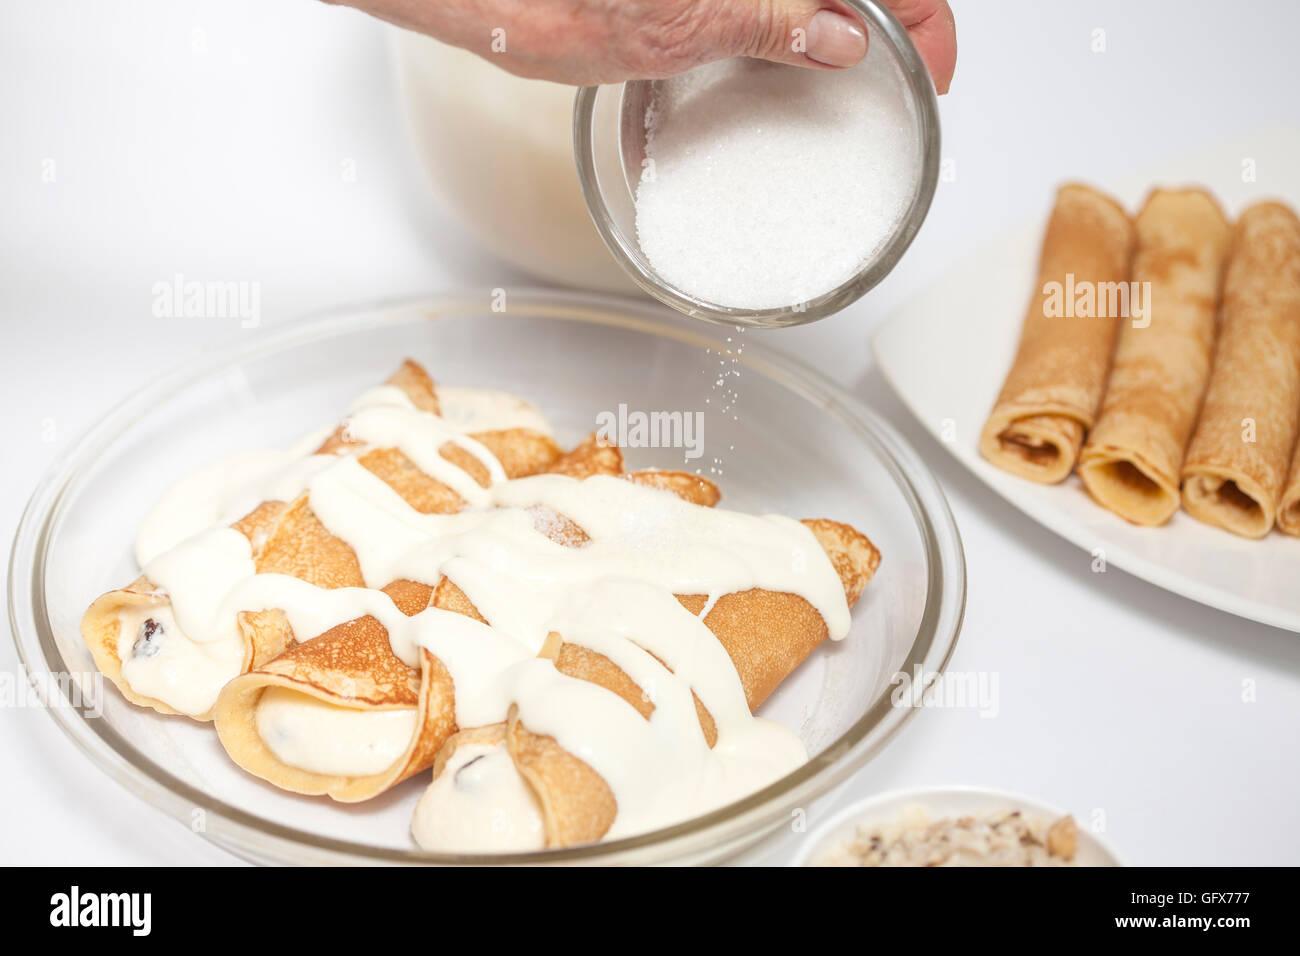 Sprinkling sugar over the topfen füllen crepes - Stock Image